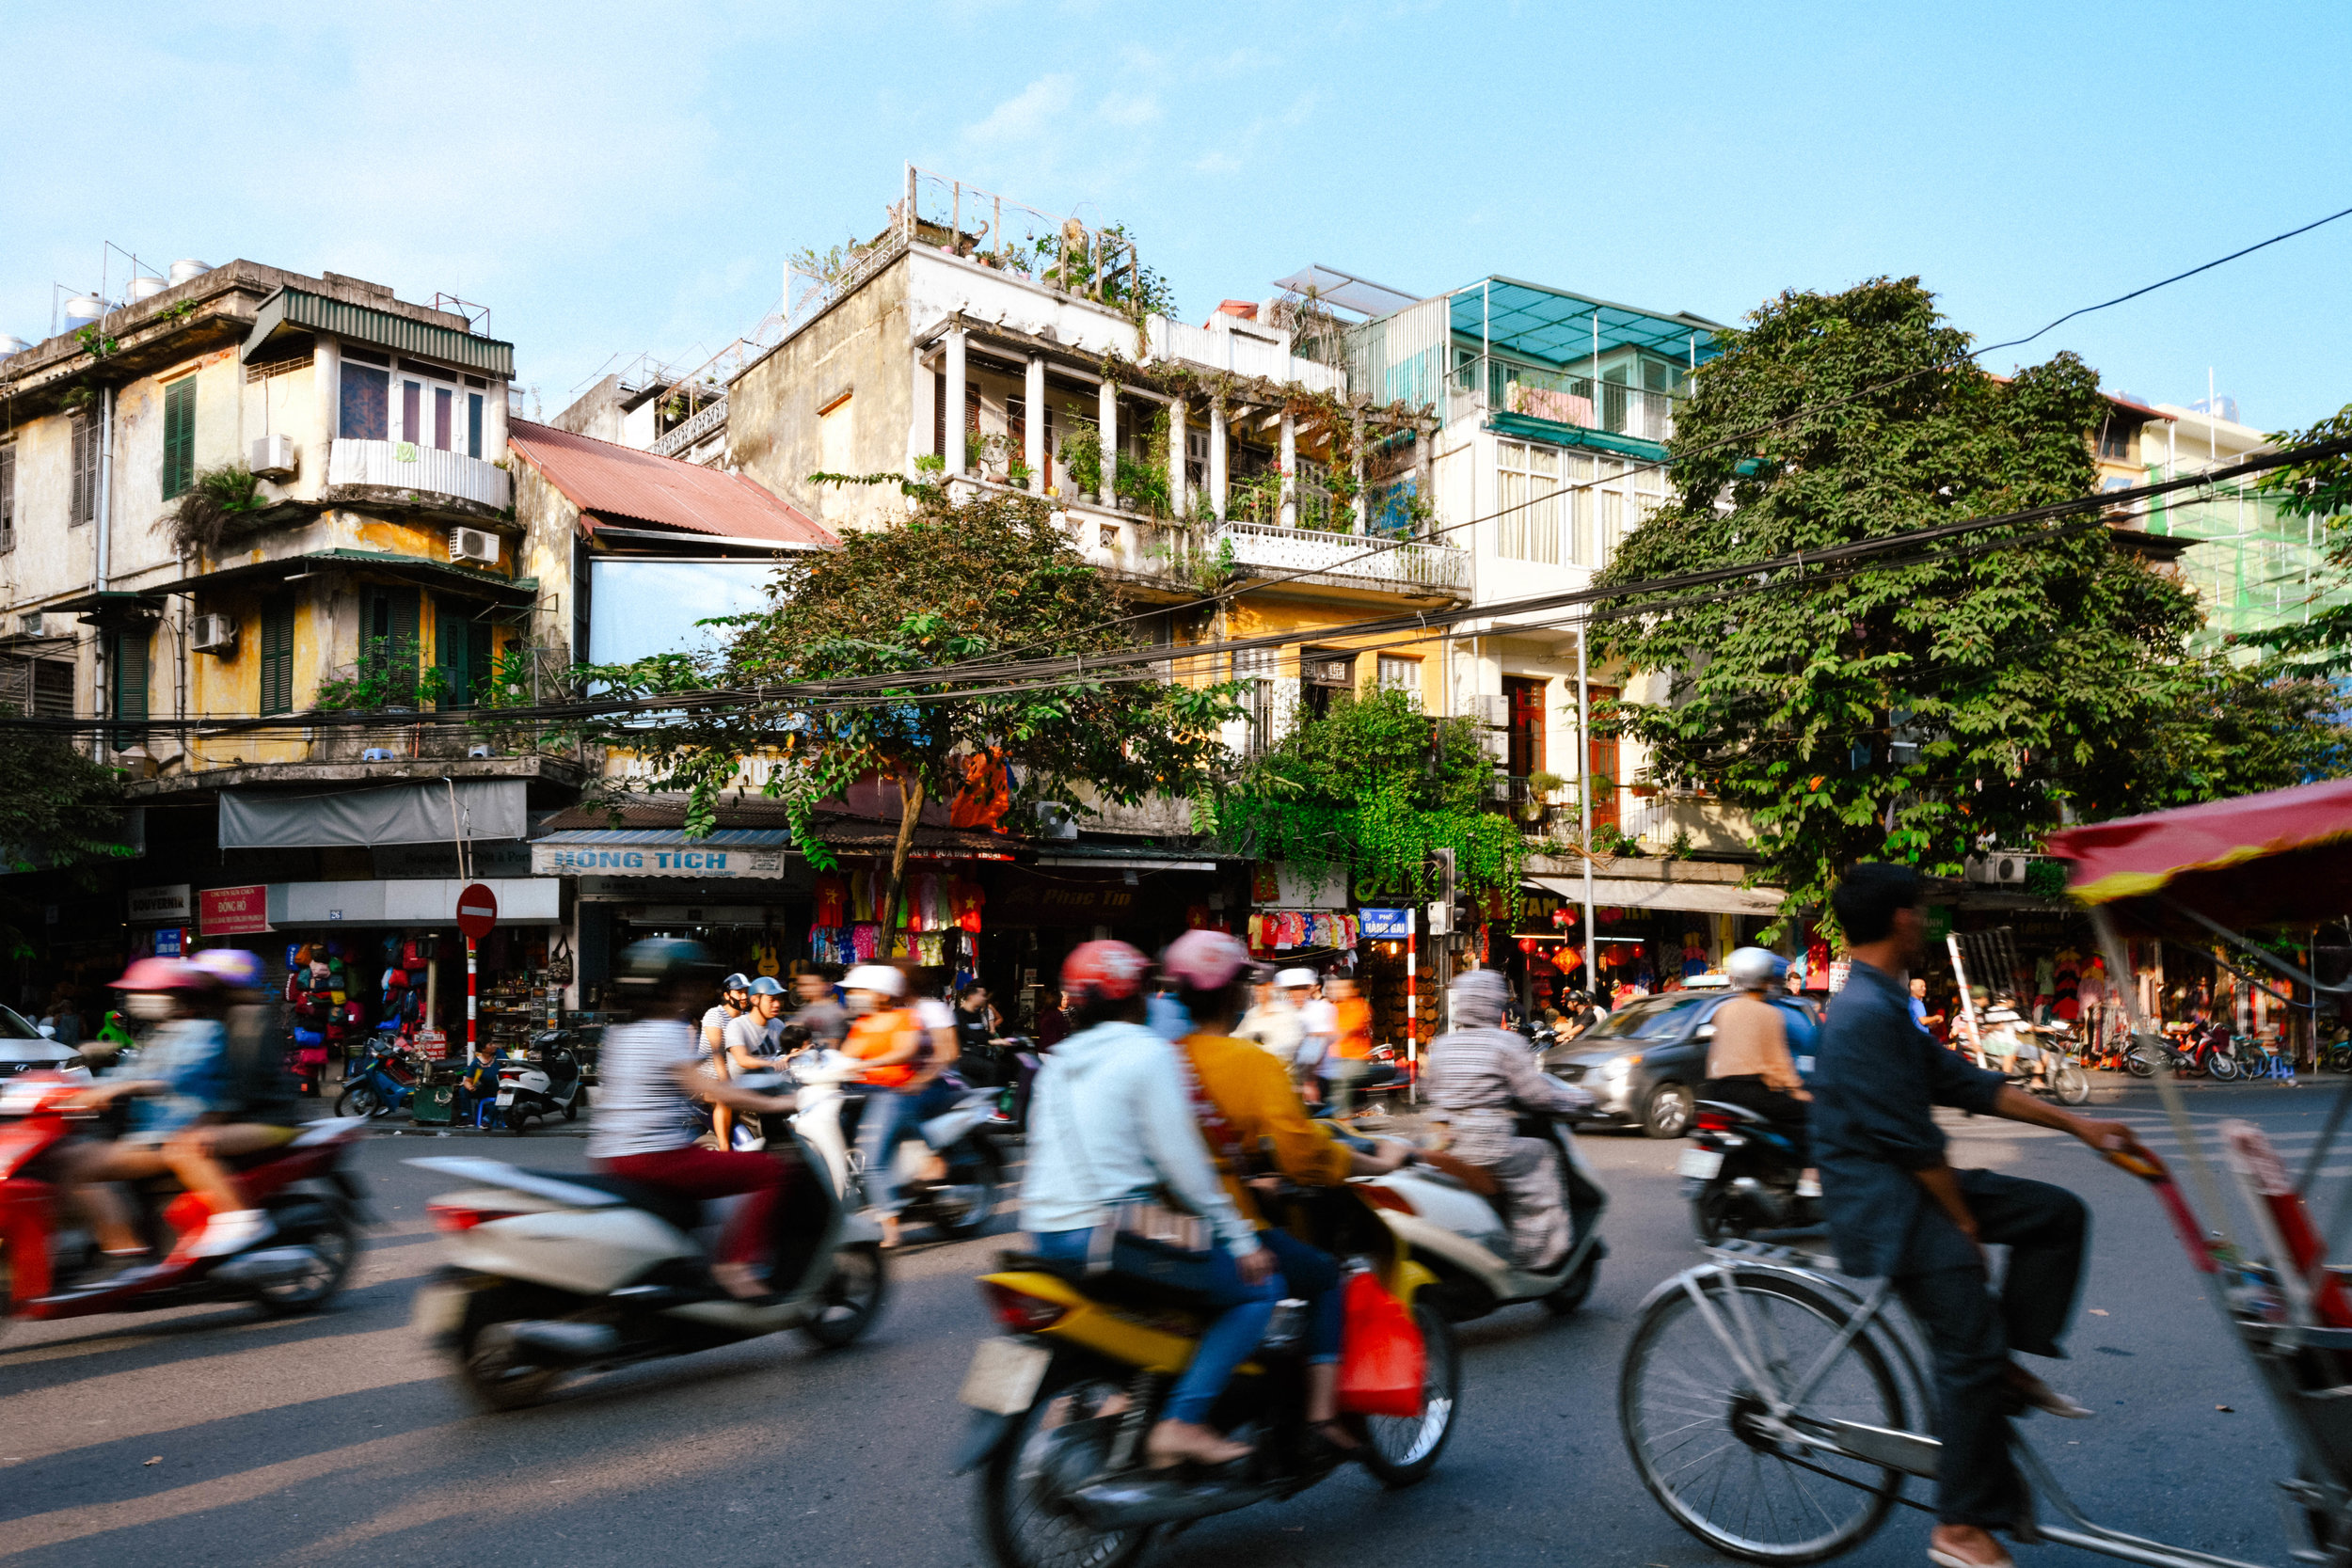 crowded street traffic in Hanoi